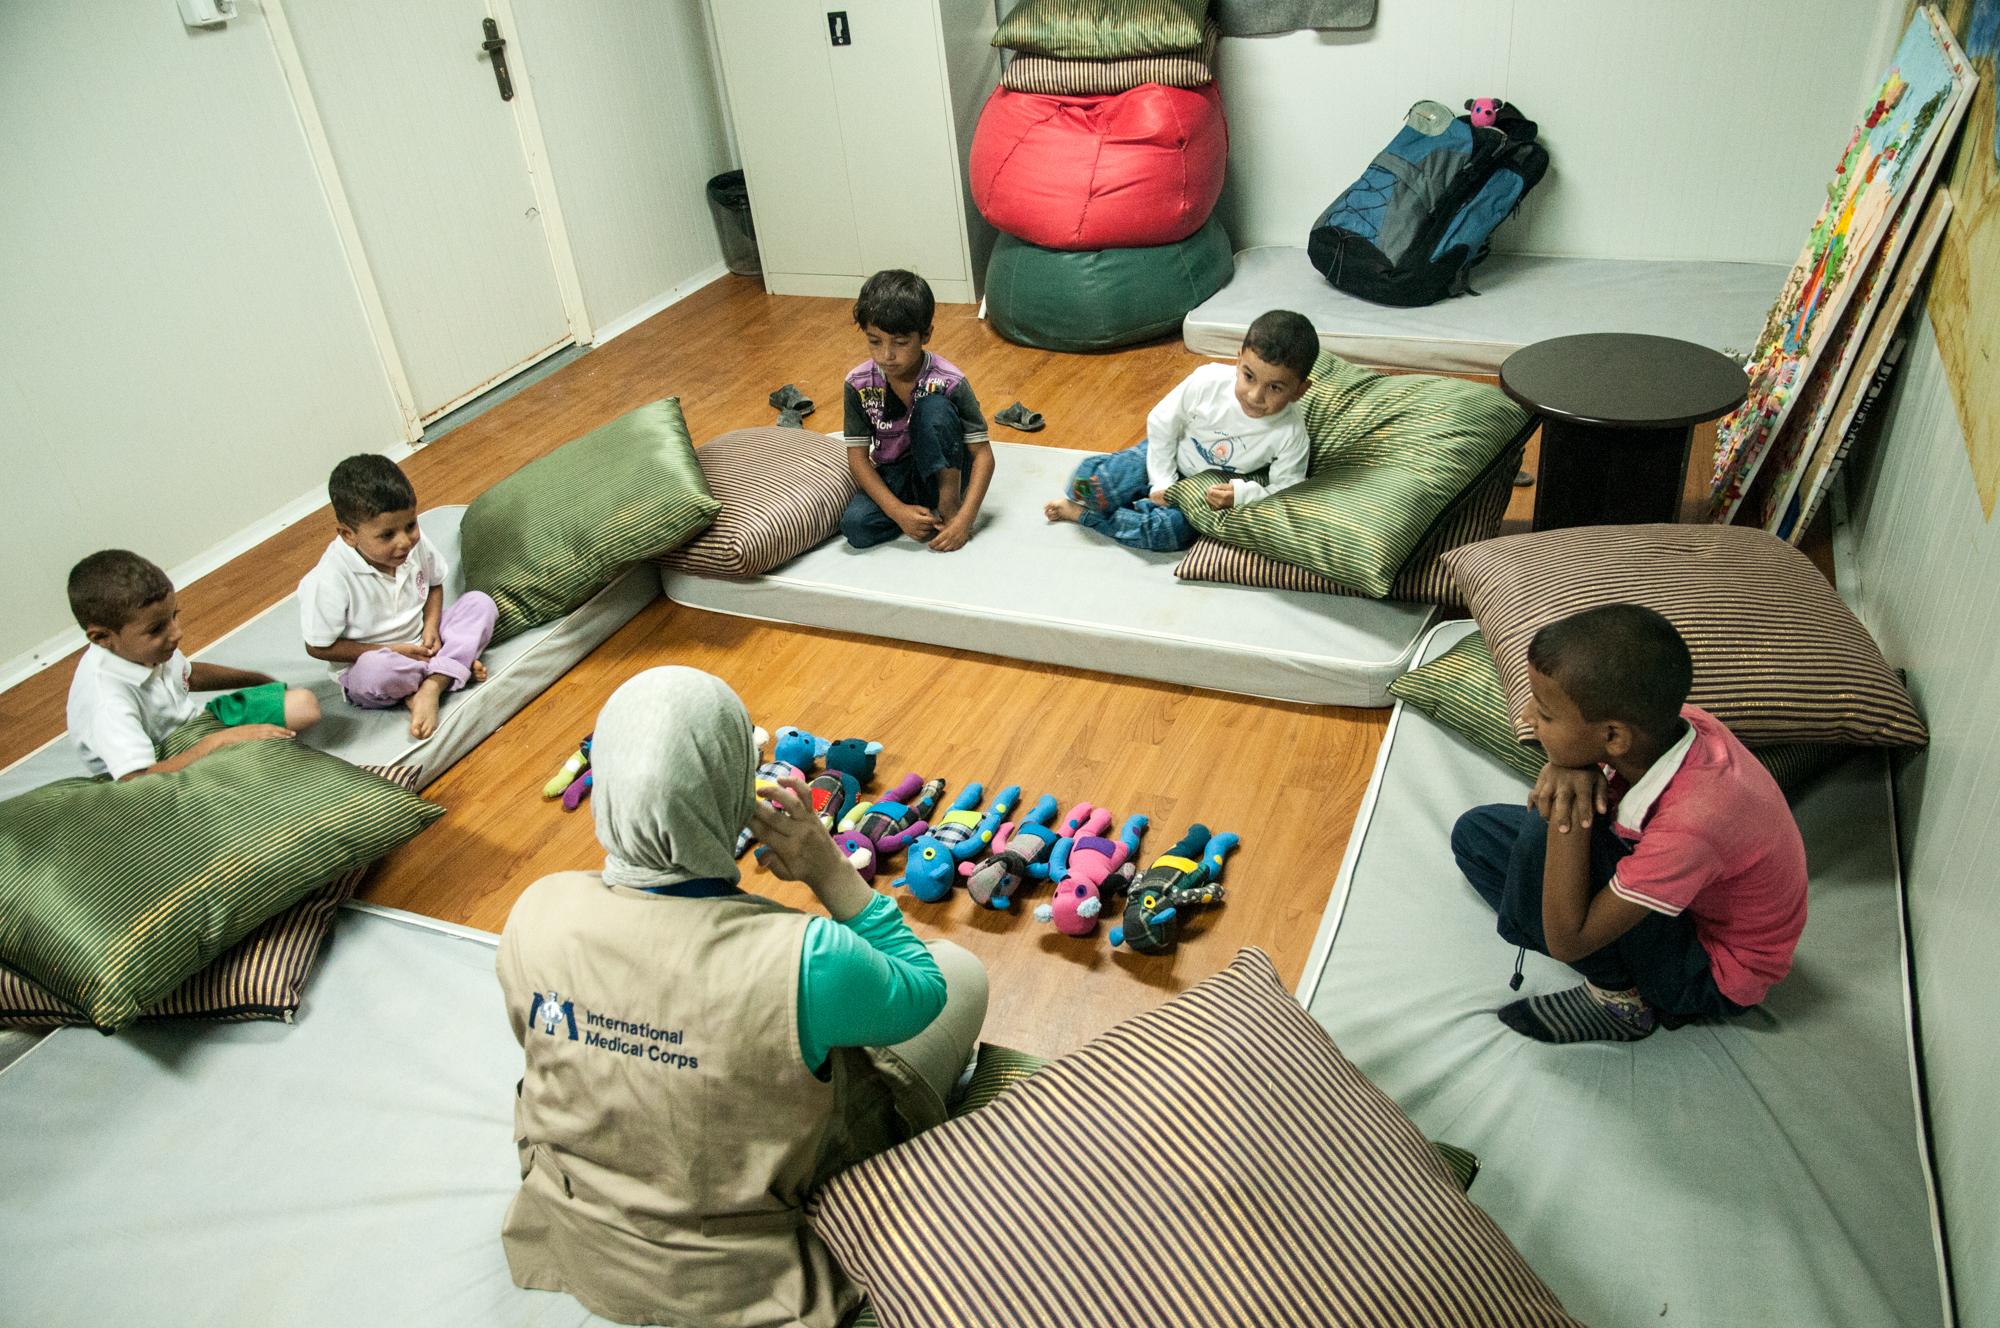 Refugee-Children-Jordan-Aug-2015-Copyright-Threadies-2015_DSC6151.jpg